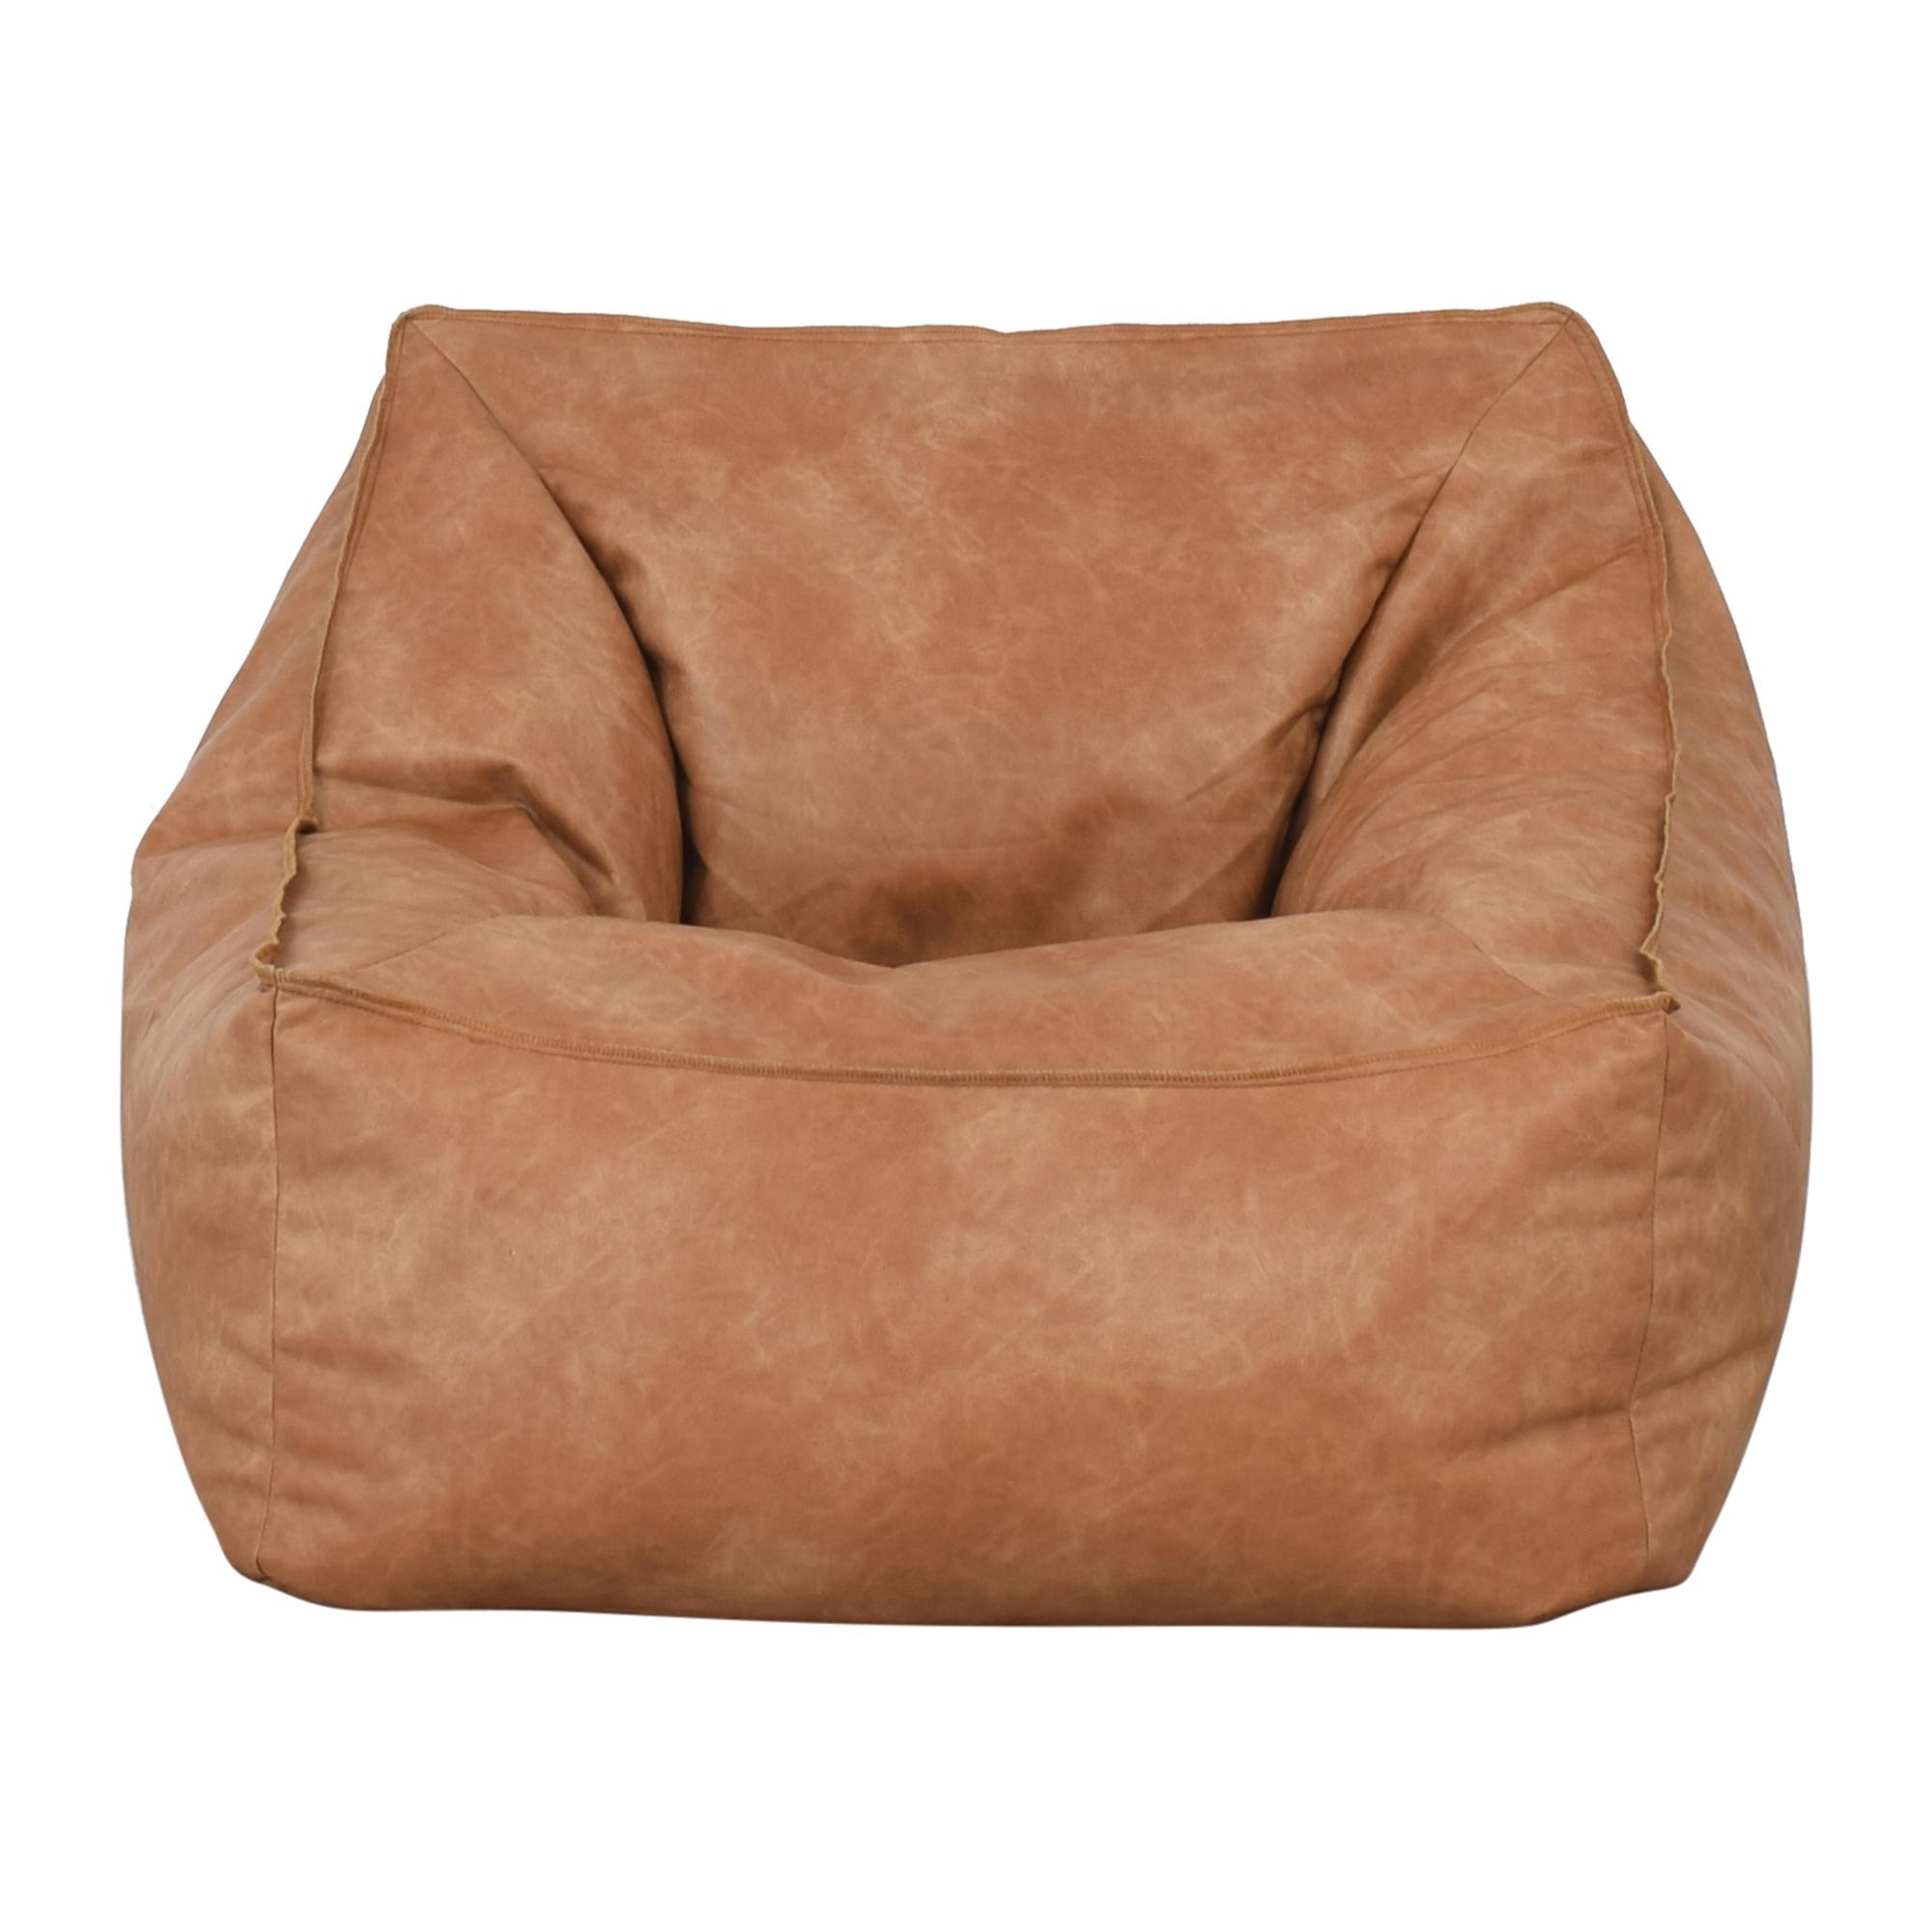 Pottery Barn Teen Modern Lounger / Chairs